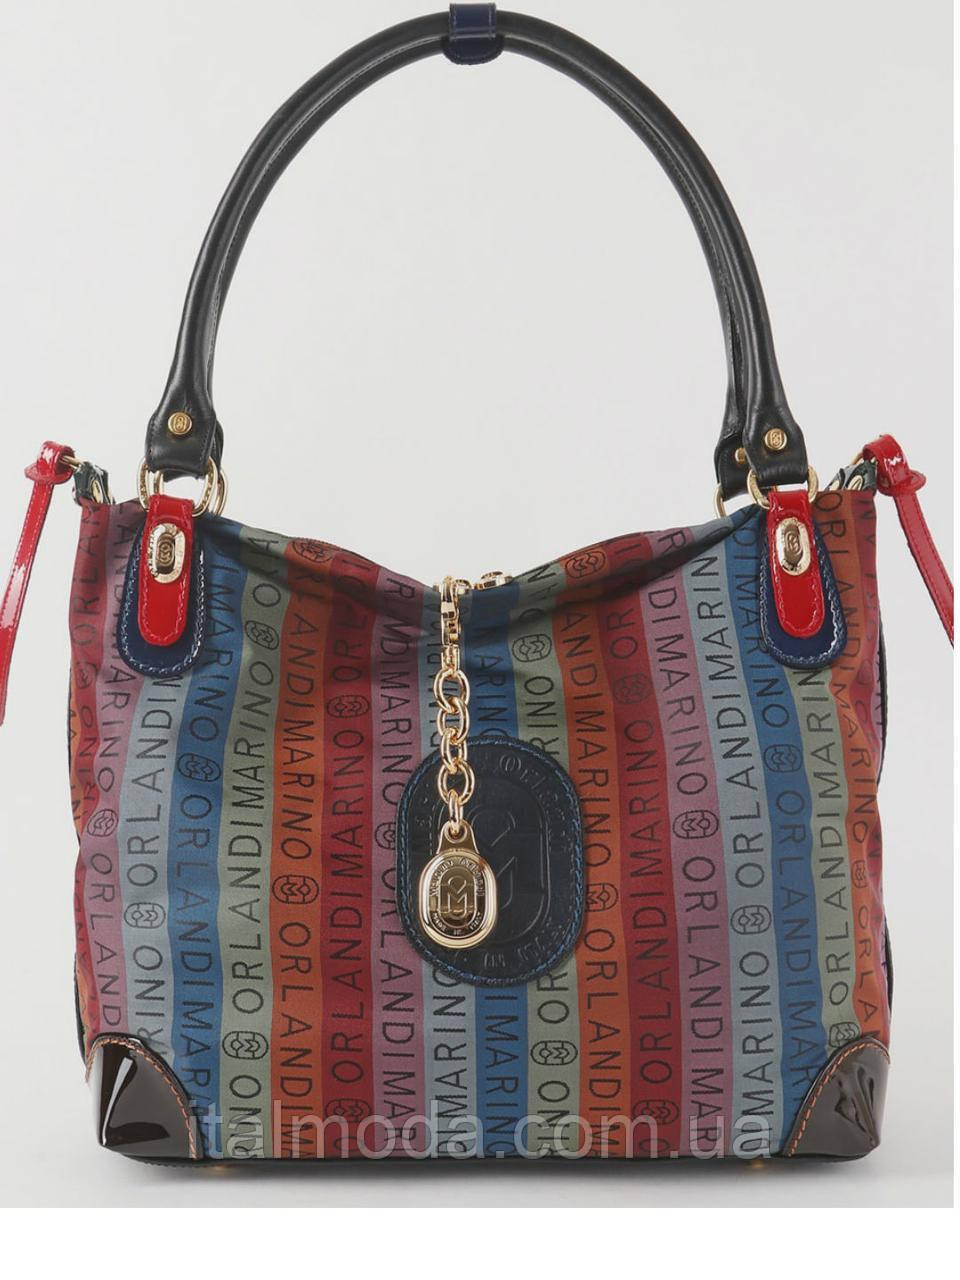 33452e3153e5 Marino Orlandi Handbags